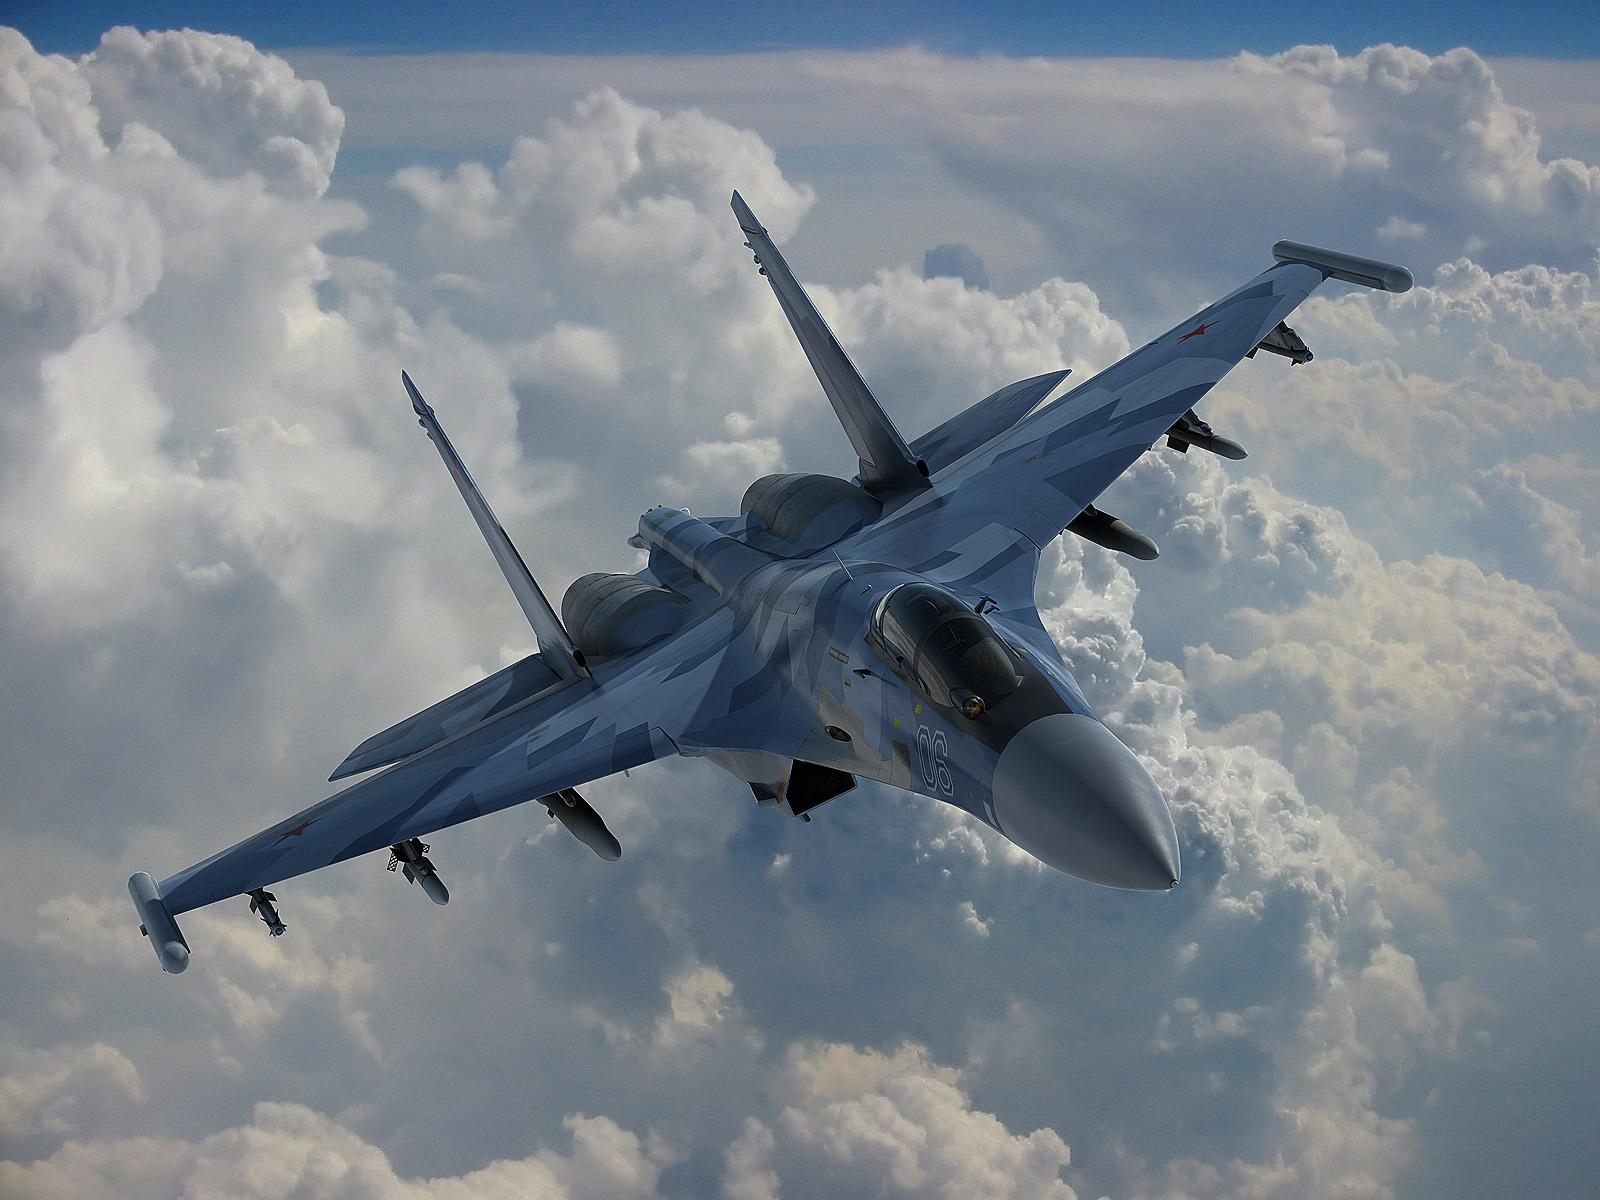 Su 35 (航空機)の画像 p1_33